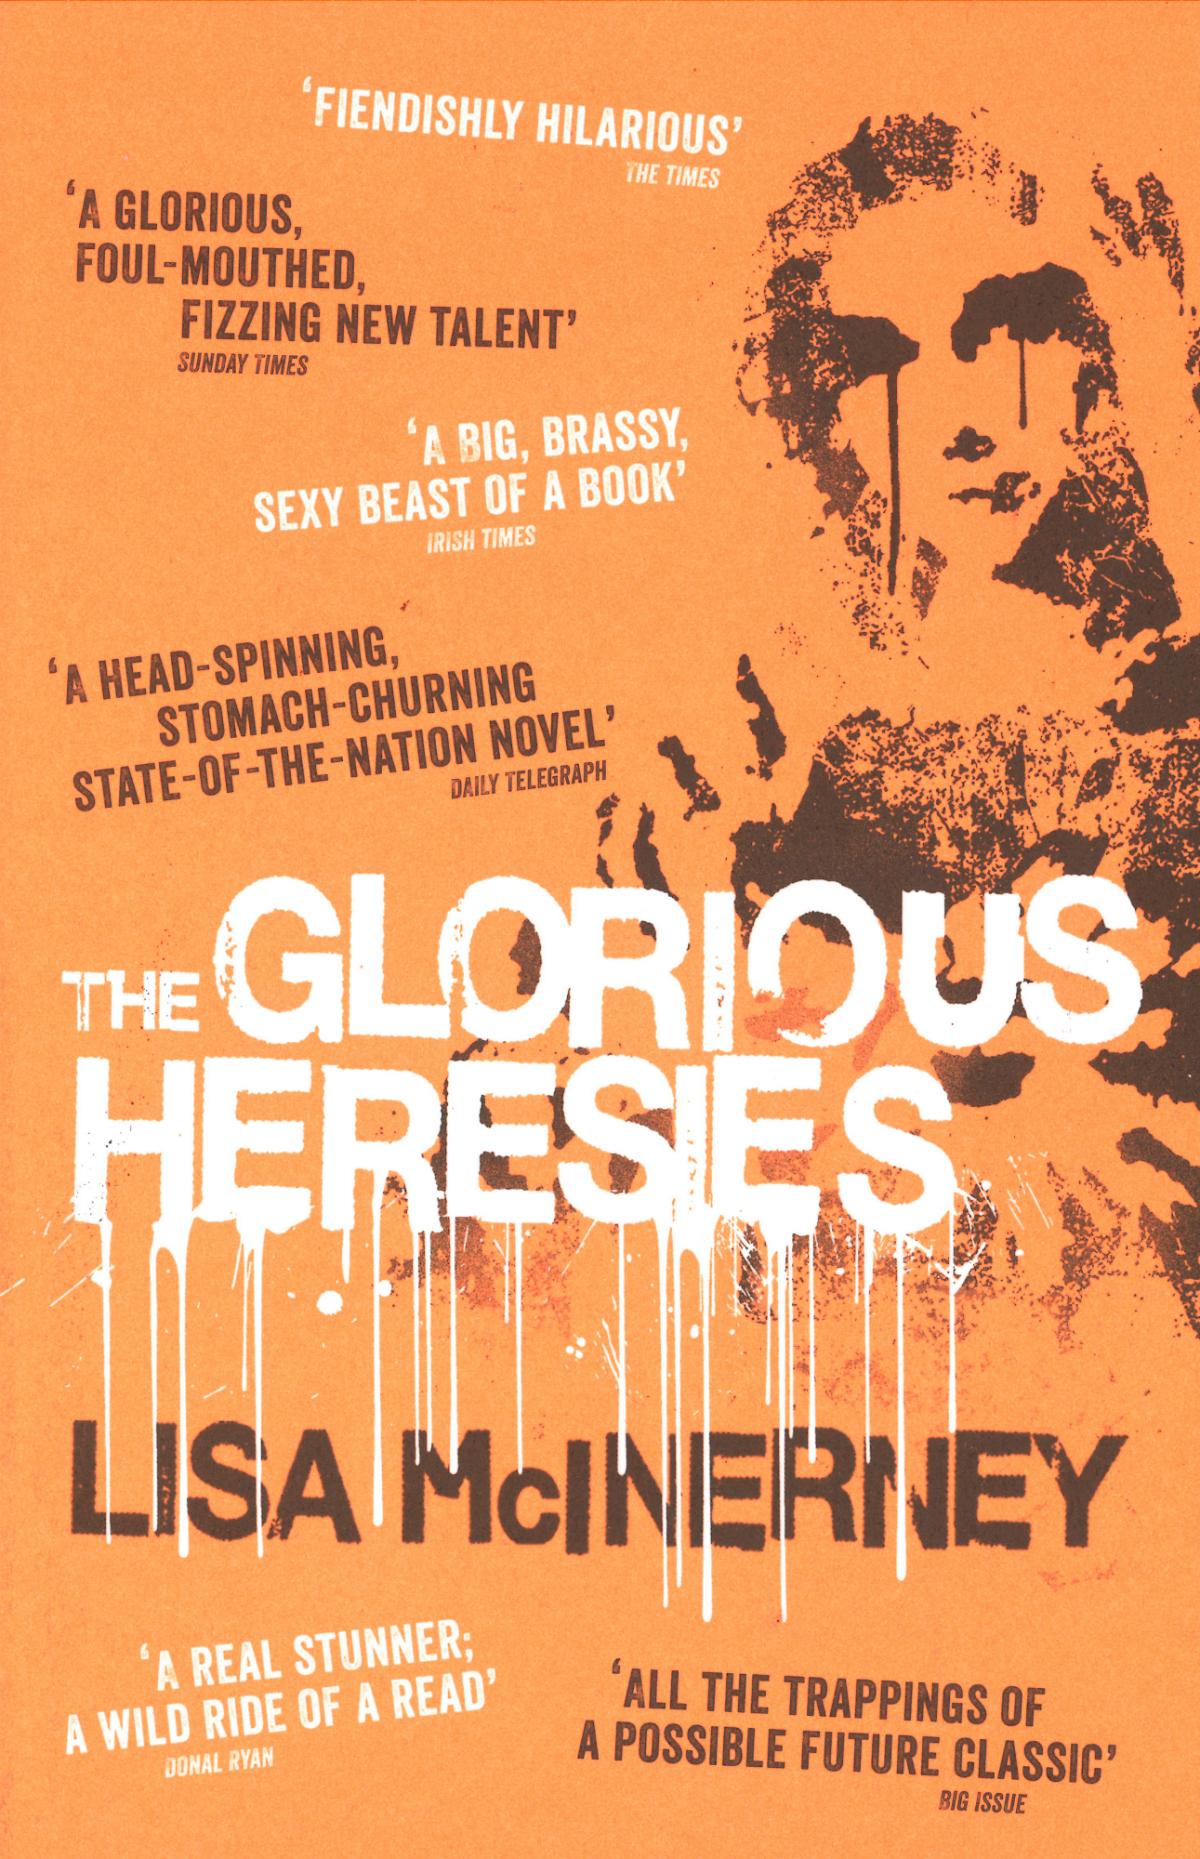 The Glorious Heresies - Lisa McInerney | © John Murry